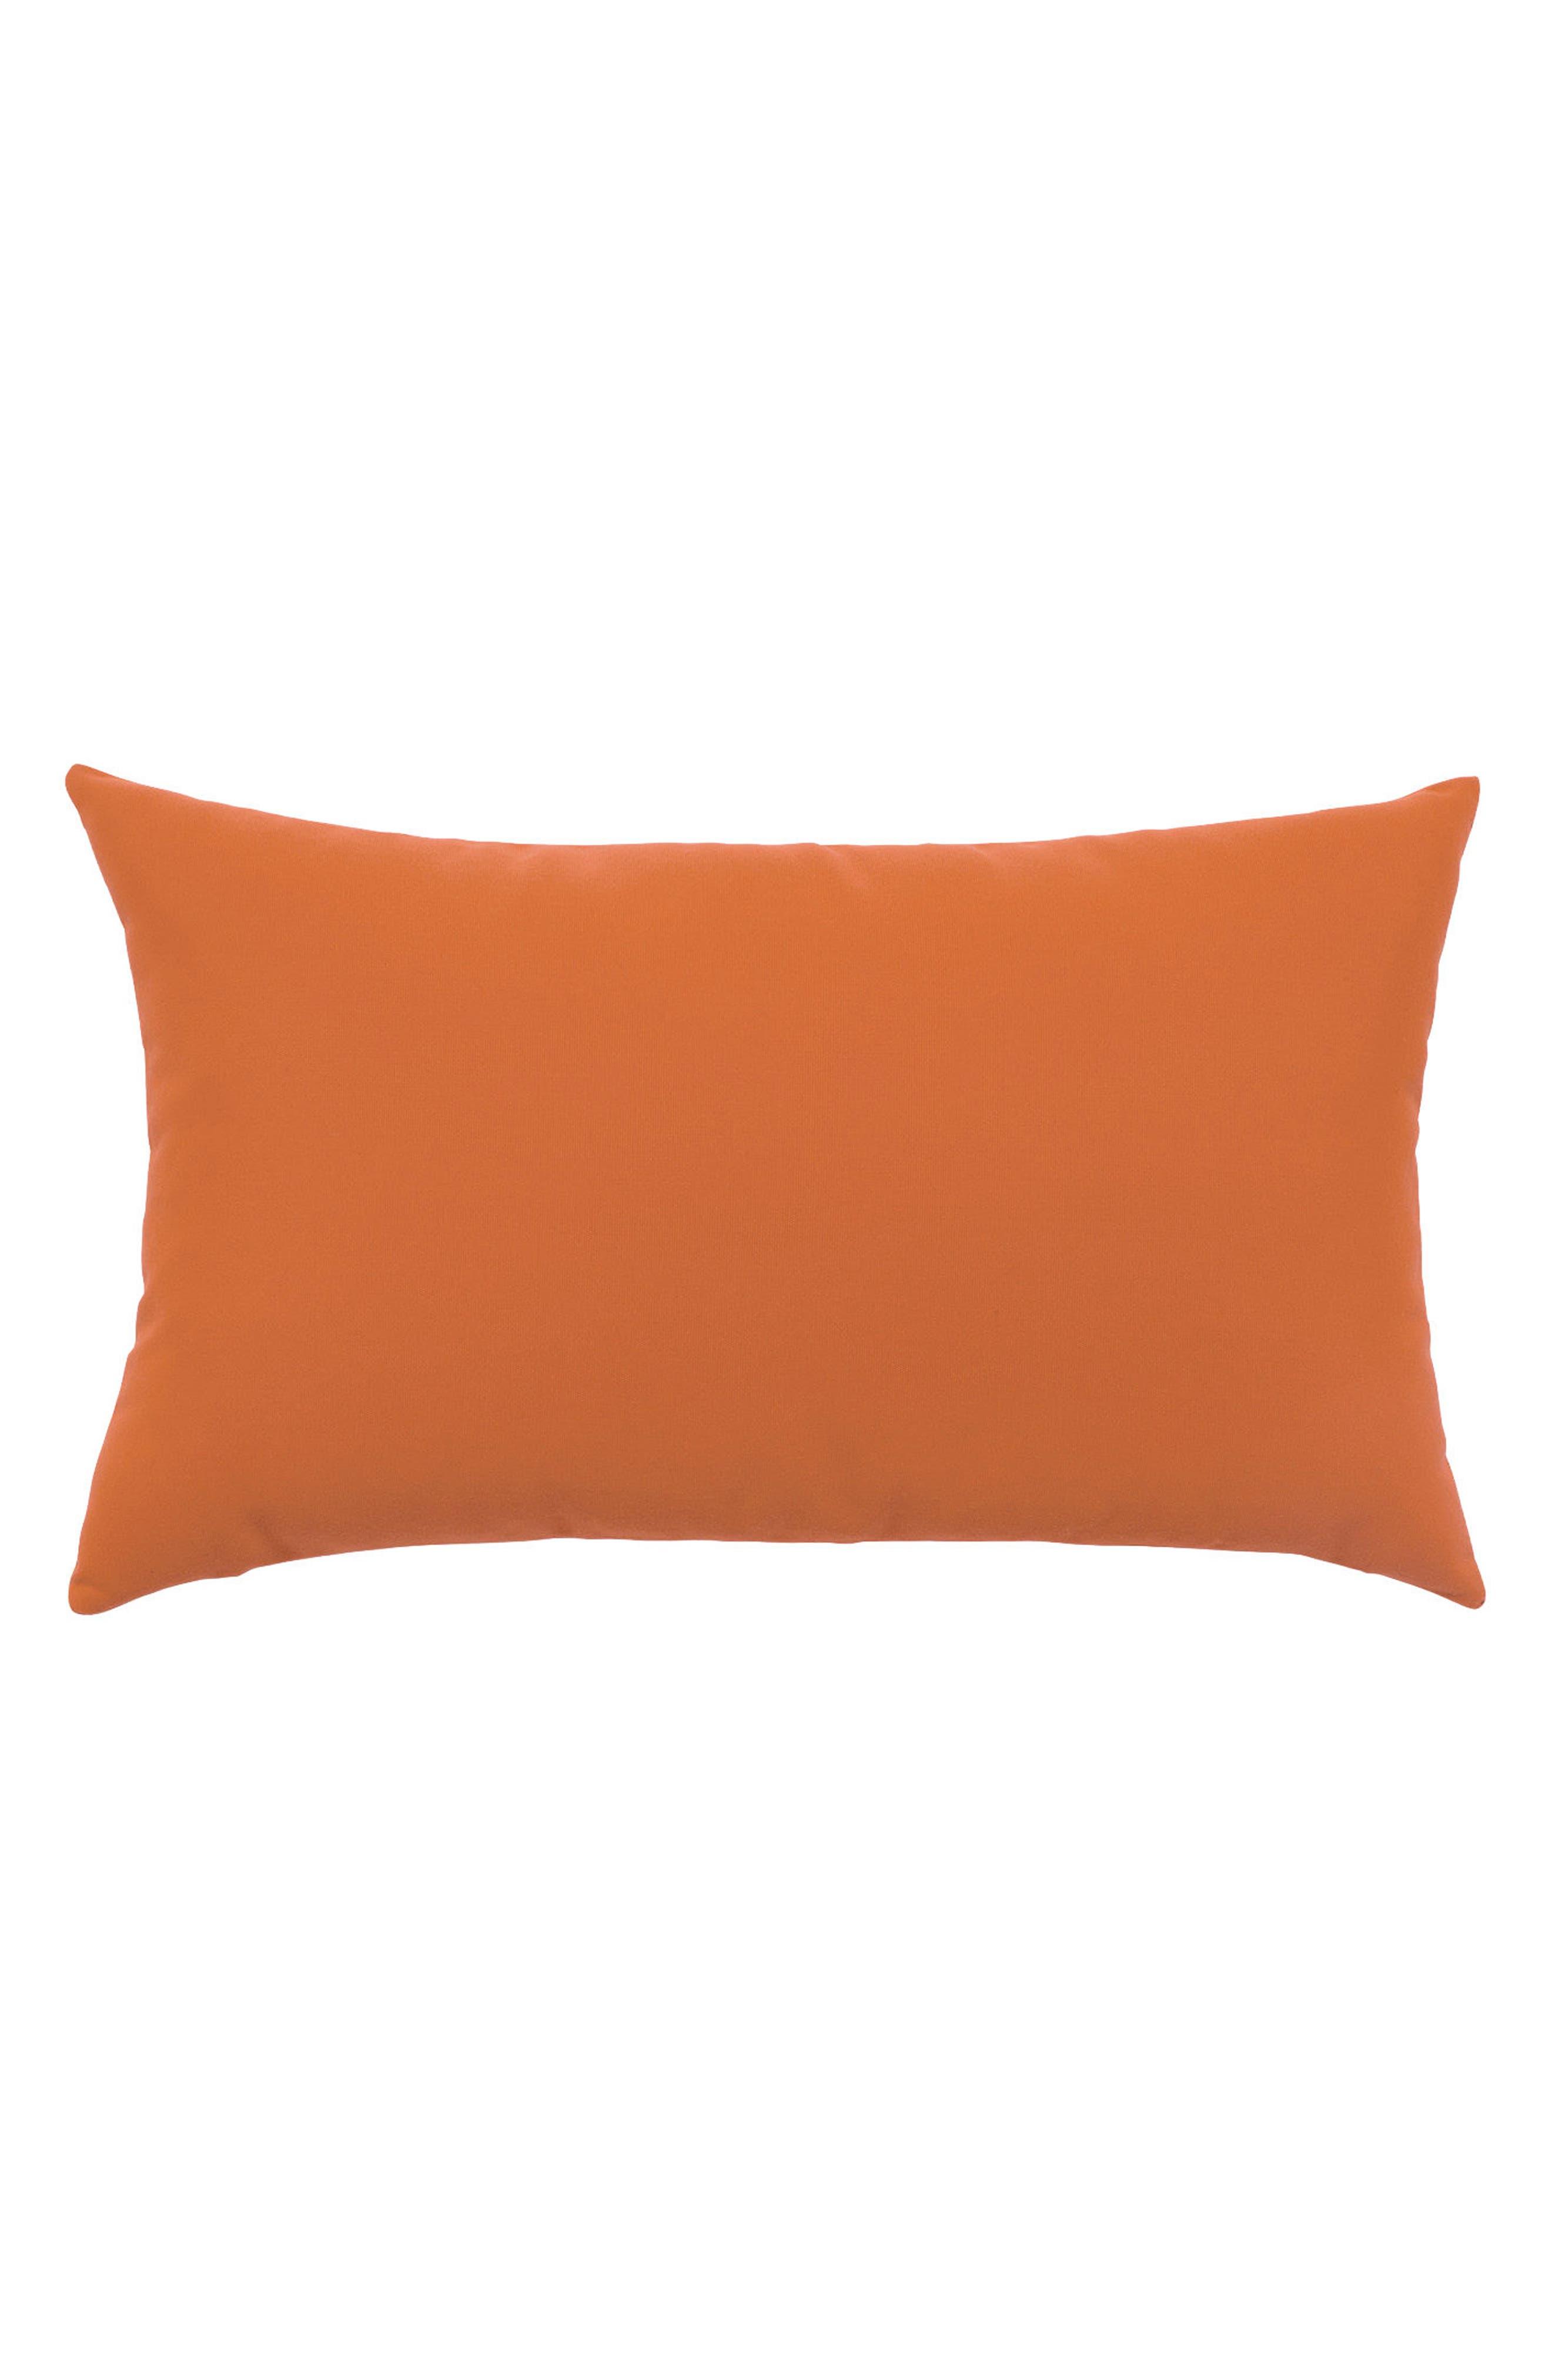 pier pillow lumbar imports spice lindon orange